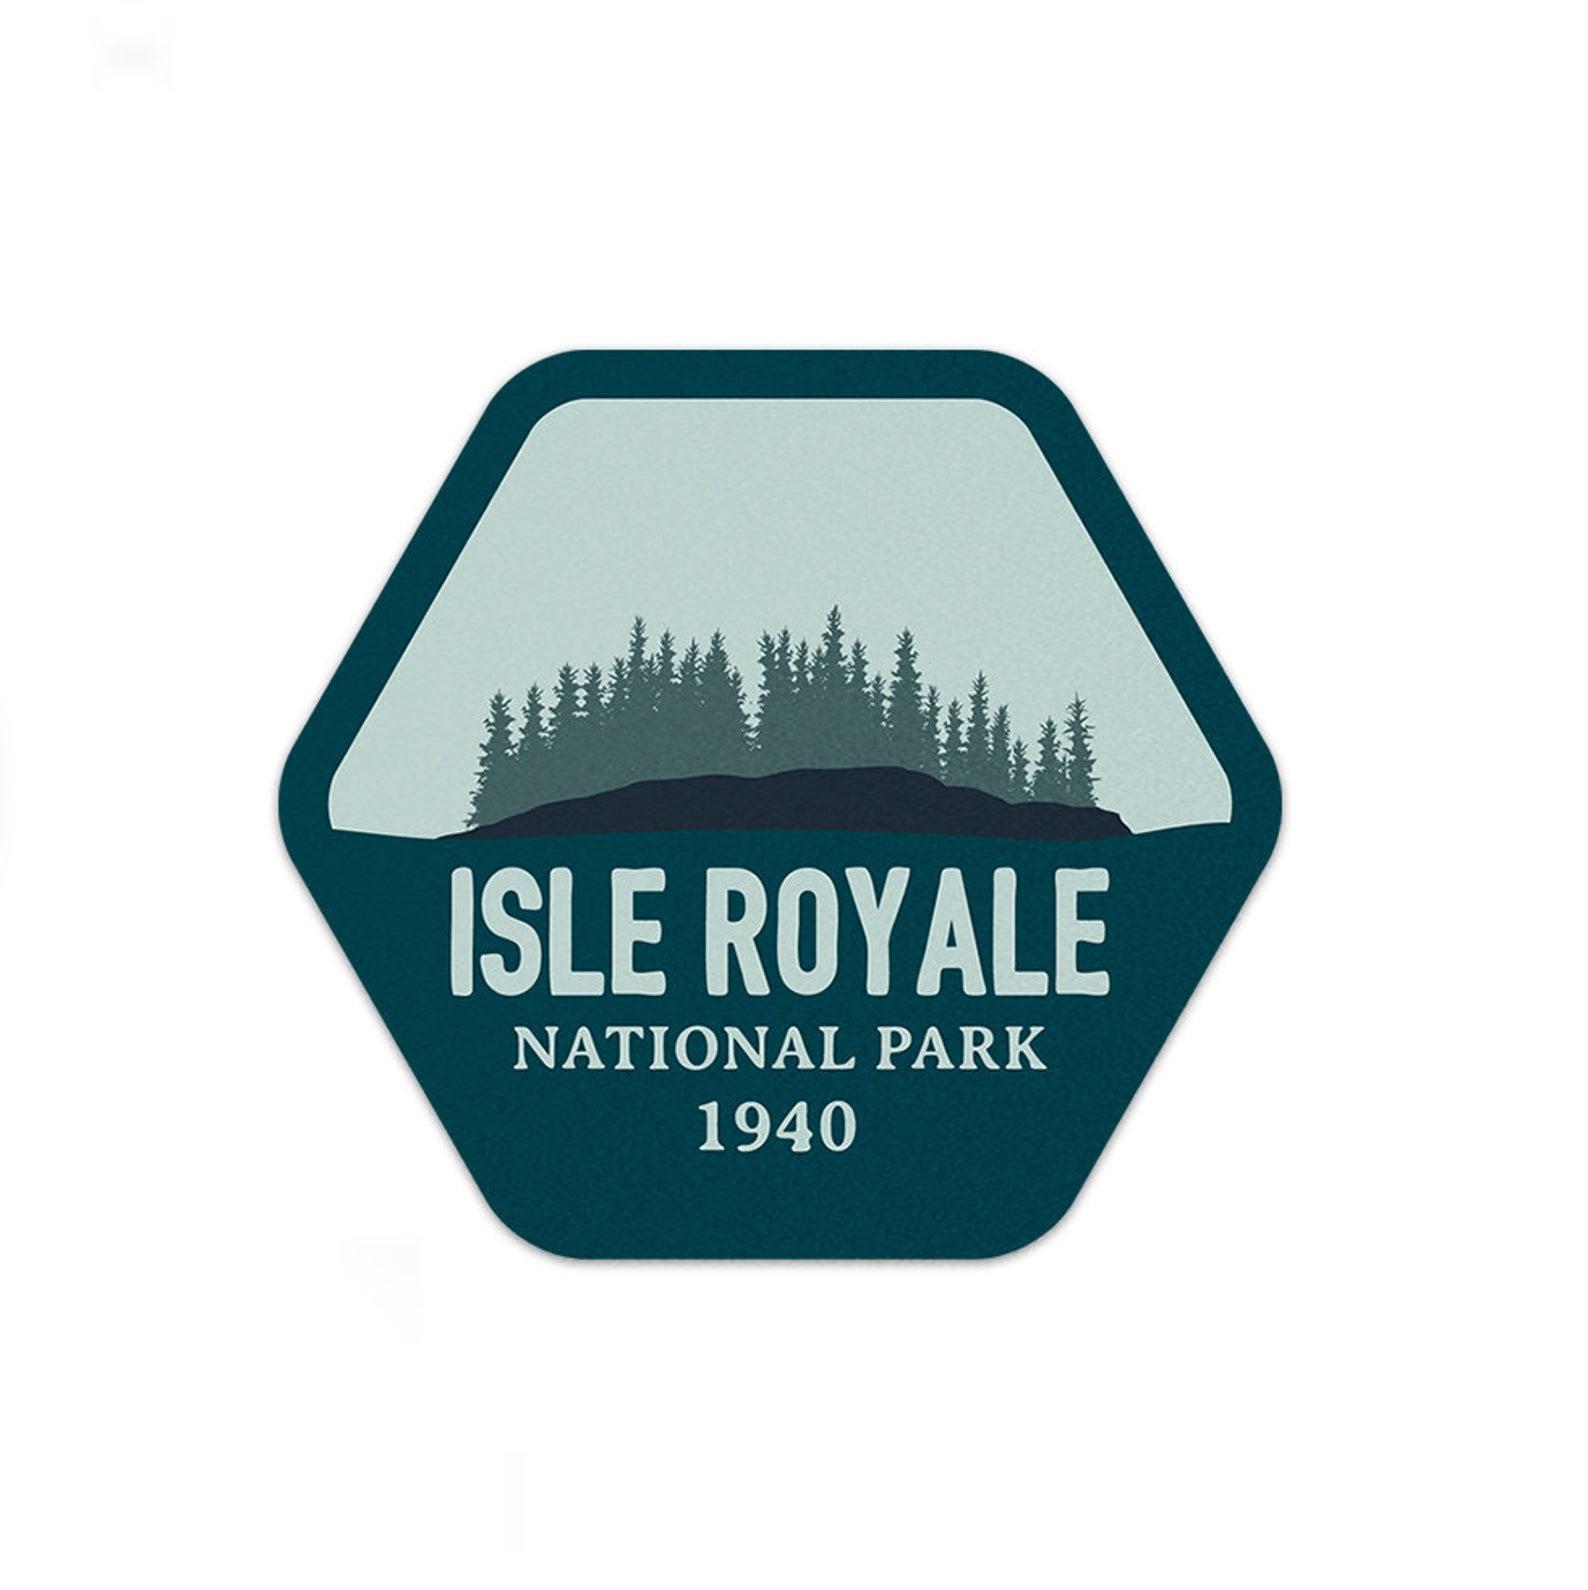 isle royale national park sticker